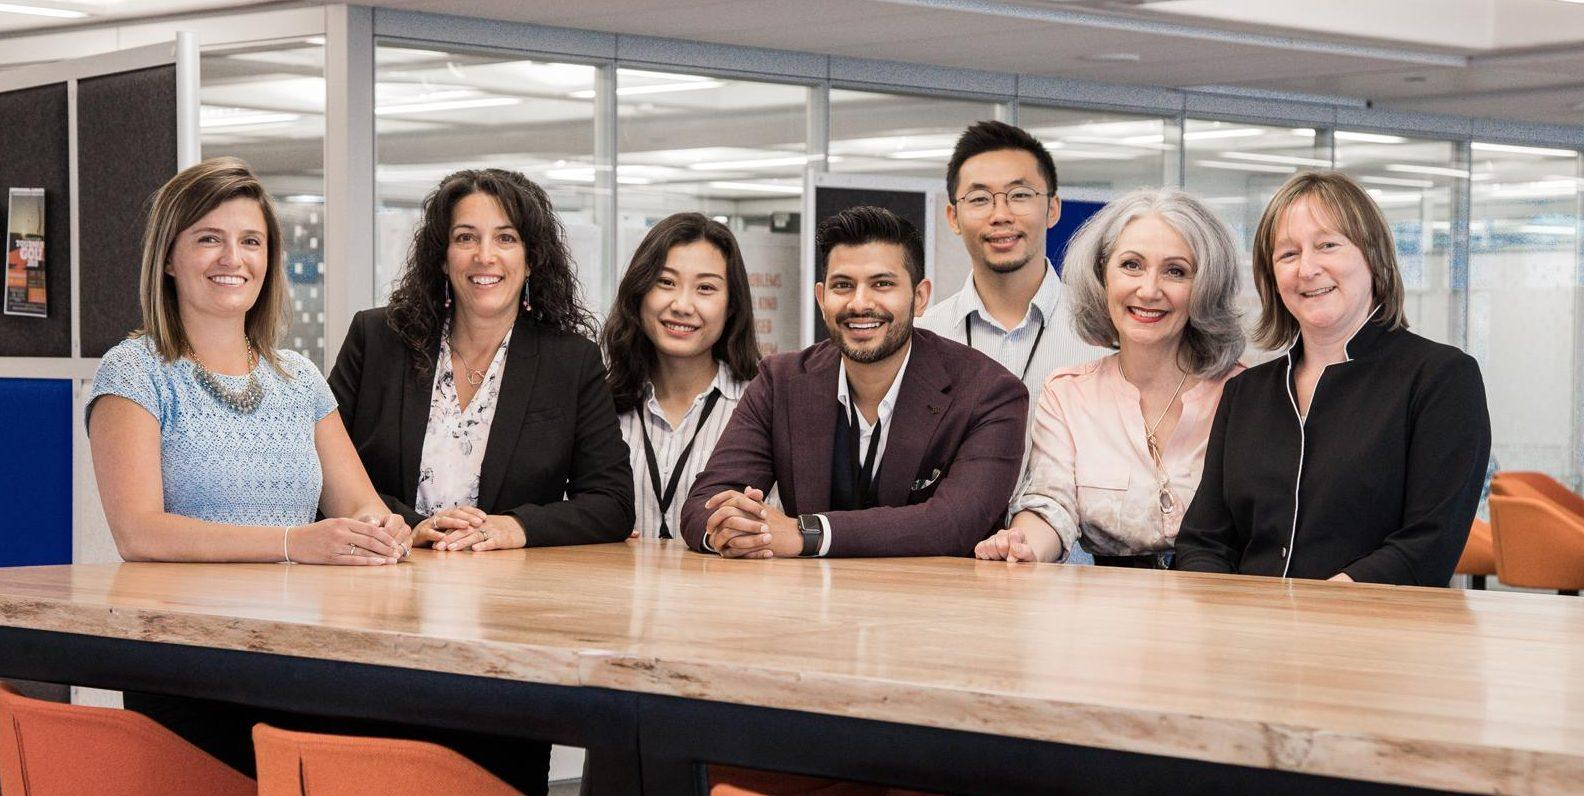 De la gauche : Mireille Lacroix, Carole Nault, Jinwei Hu (Silver), Shawn Kanungo (Silver), Leyuan Yu (Siver), Marie-Claude Decobert-Delcourt et Annie Guilbault